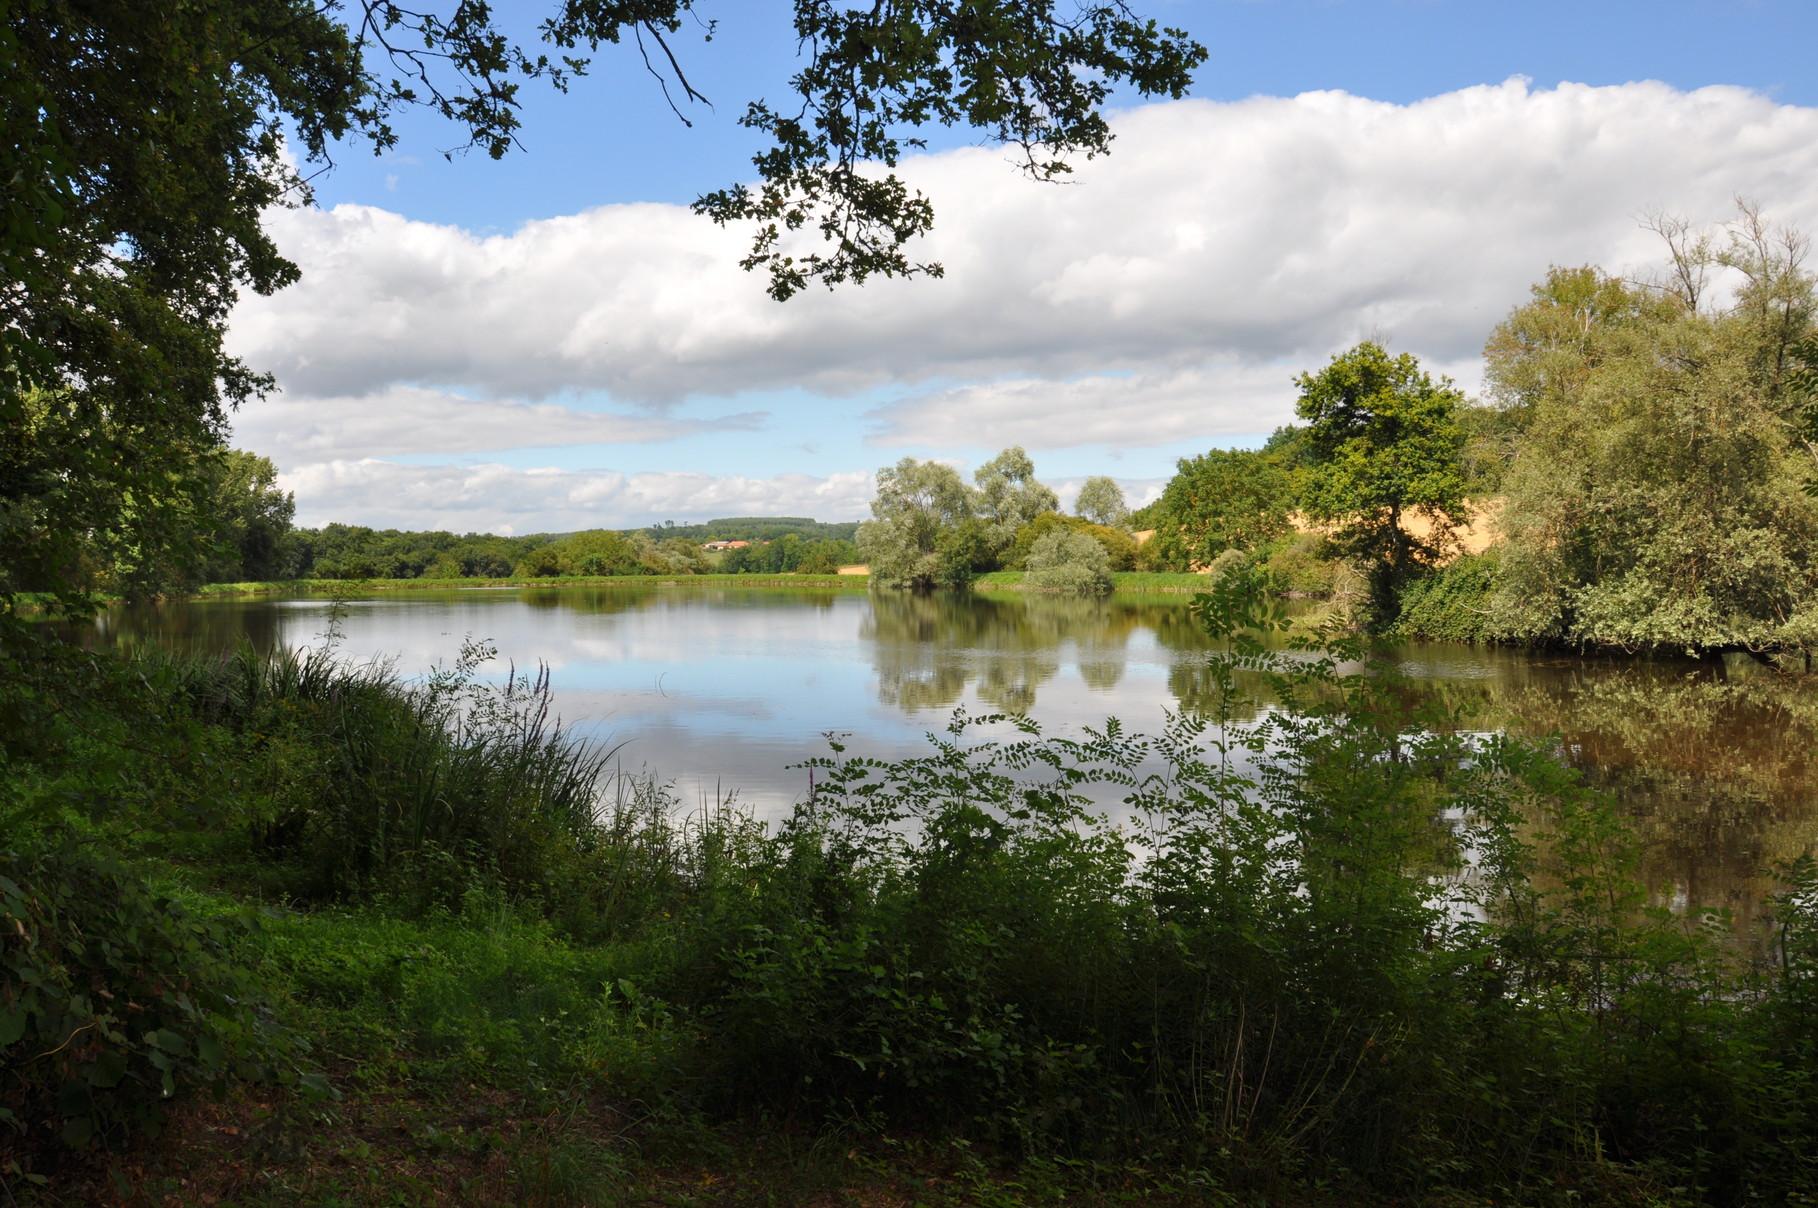 Pêche dans l'étang